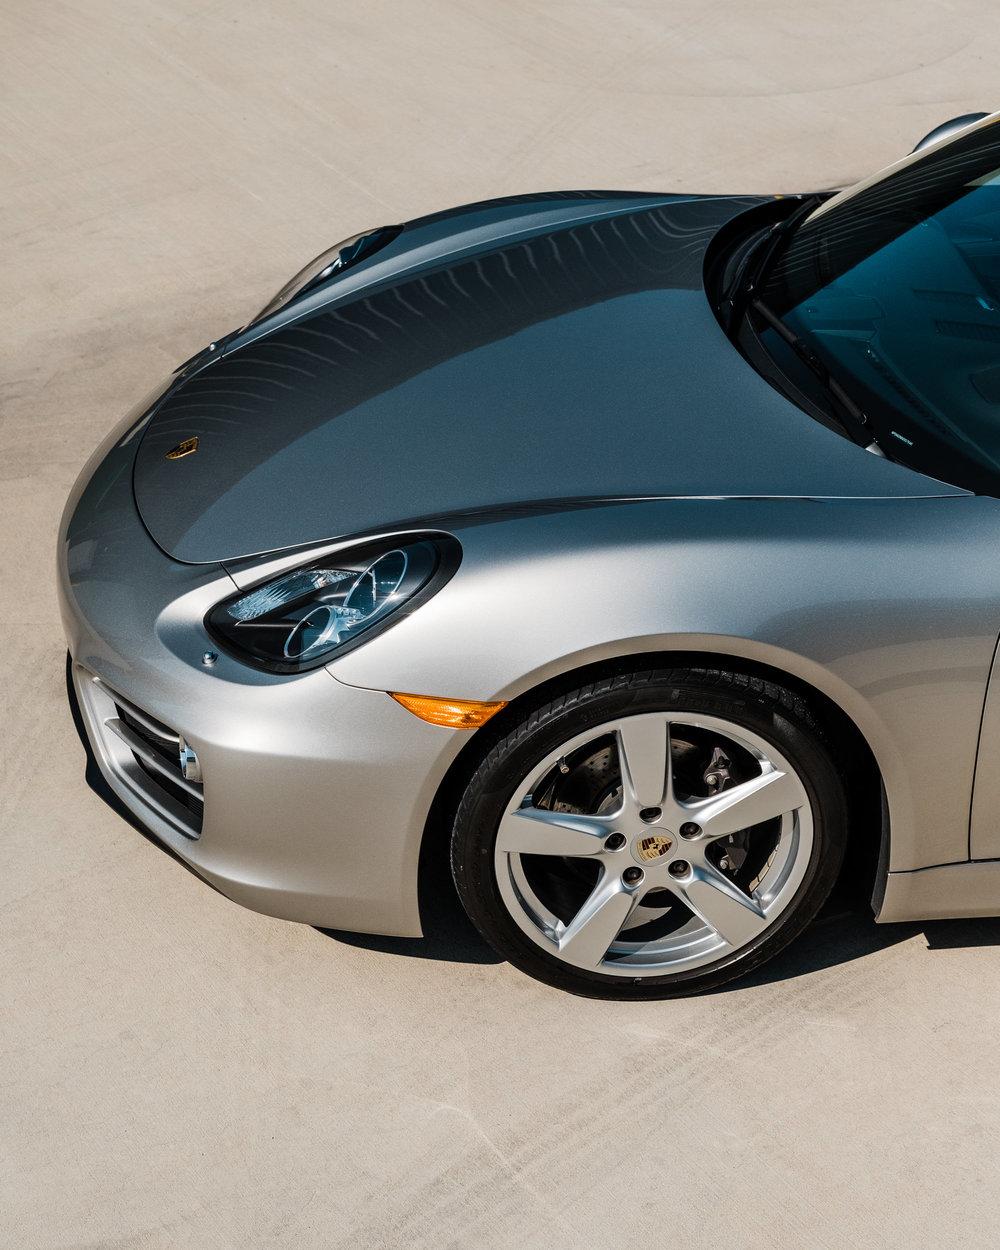 Porsche Cayman  - Ceramic Pro - Ceramic Coating - Paint Correction - Griot's Garage - Wichita Clear Bra-138.jpg